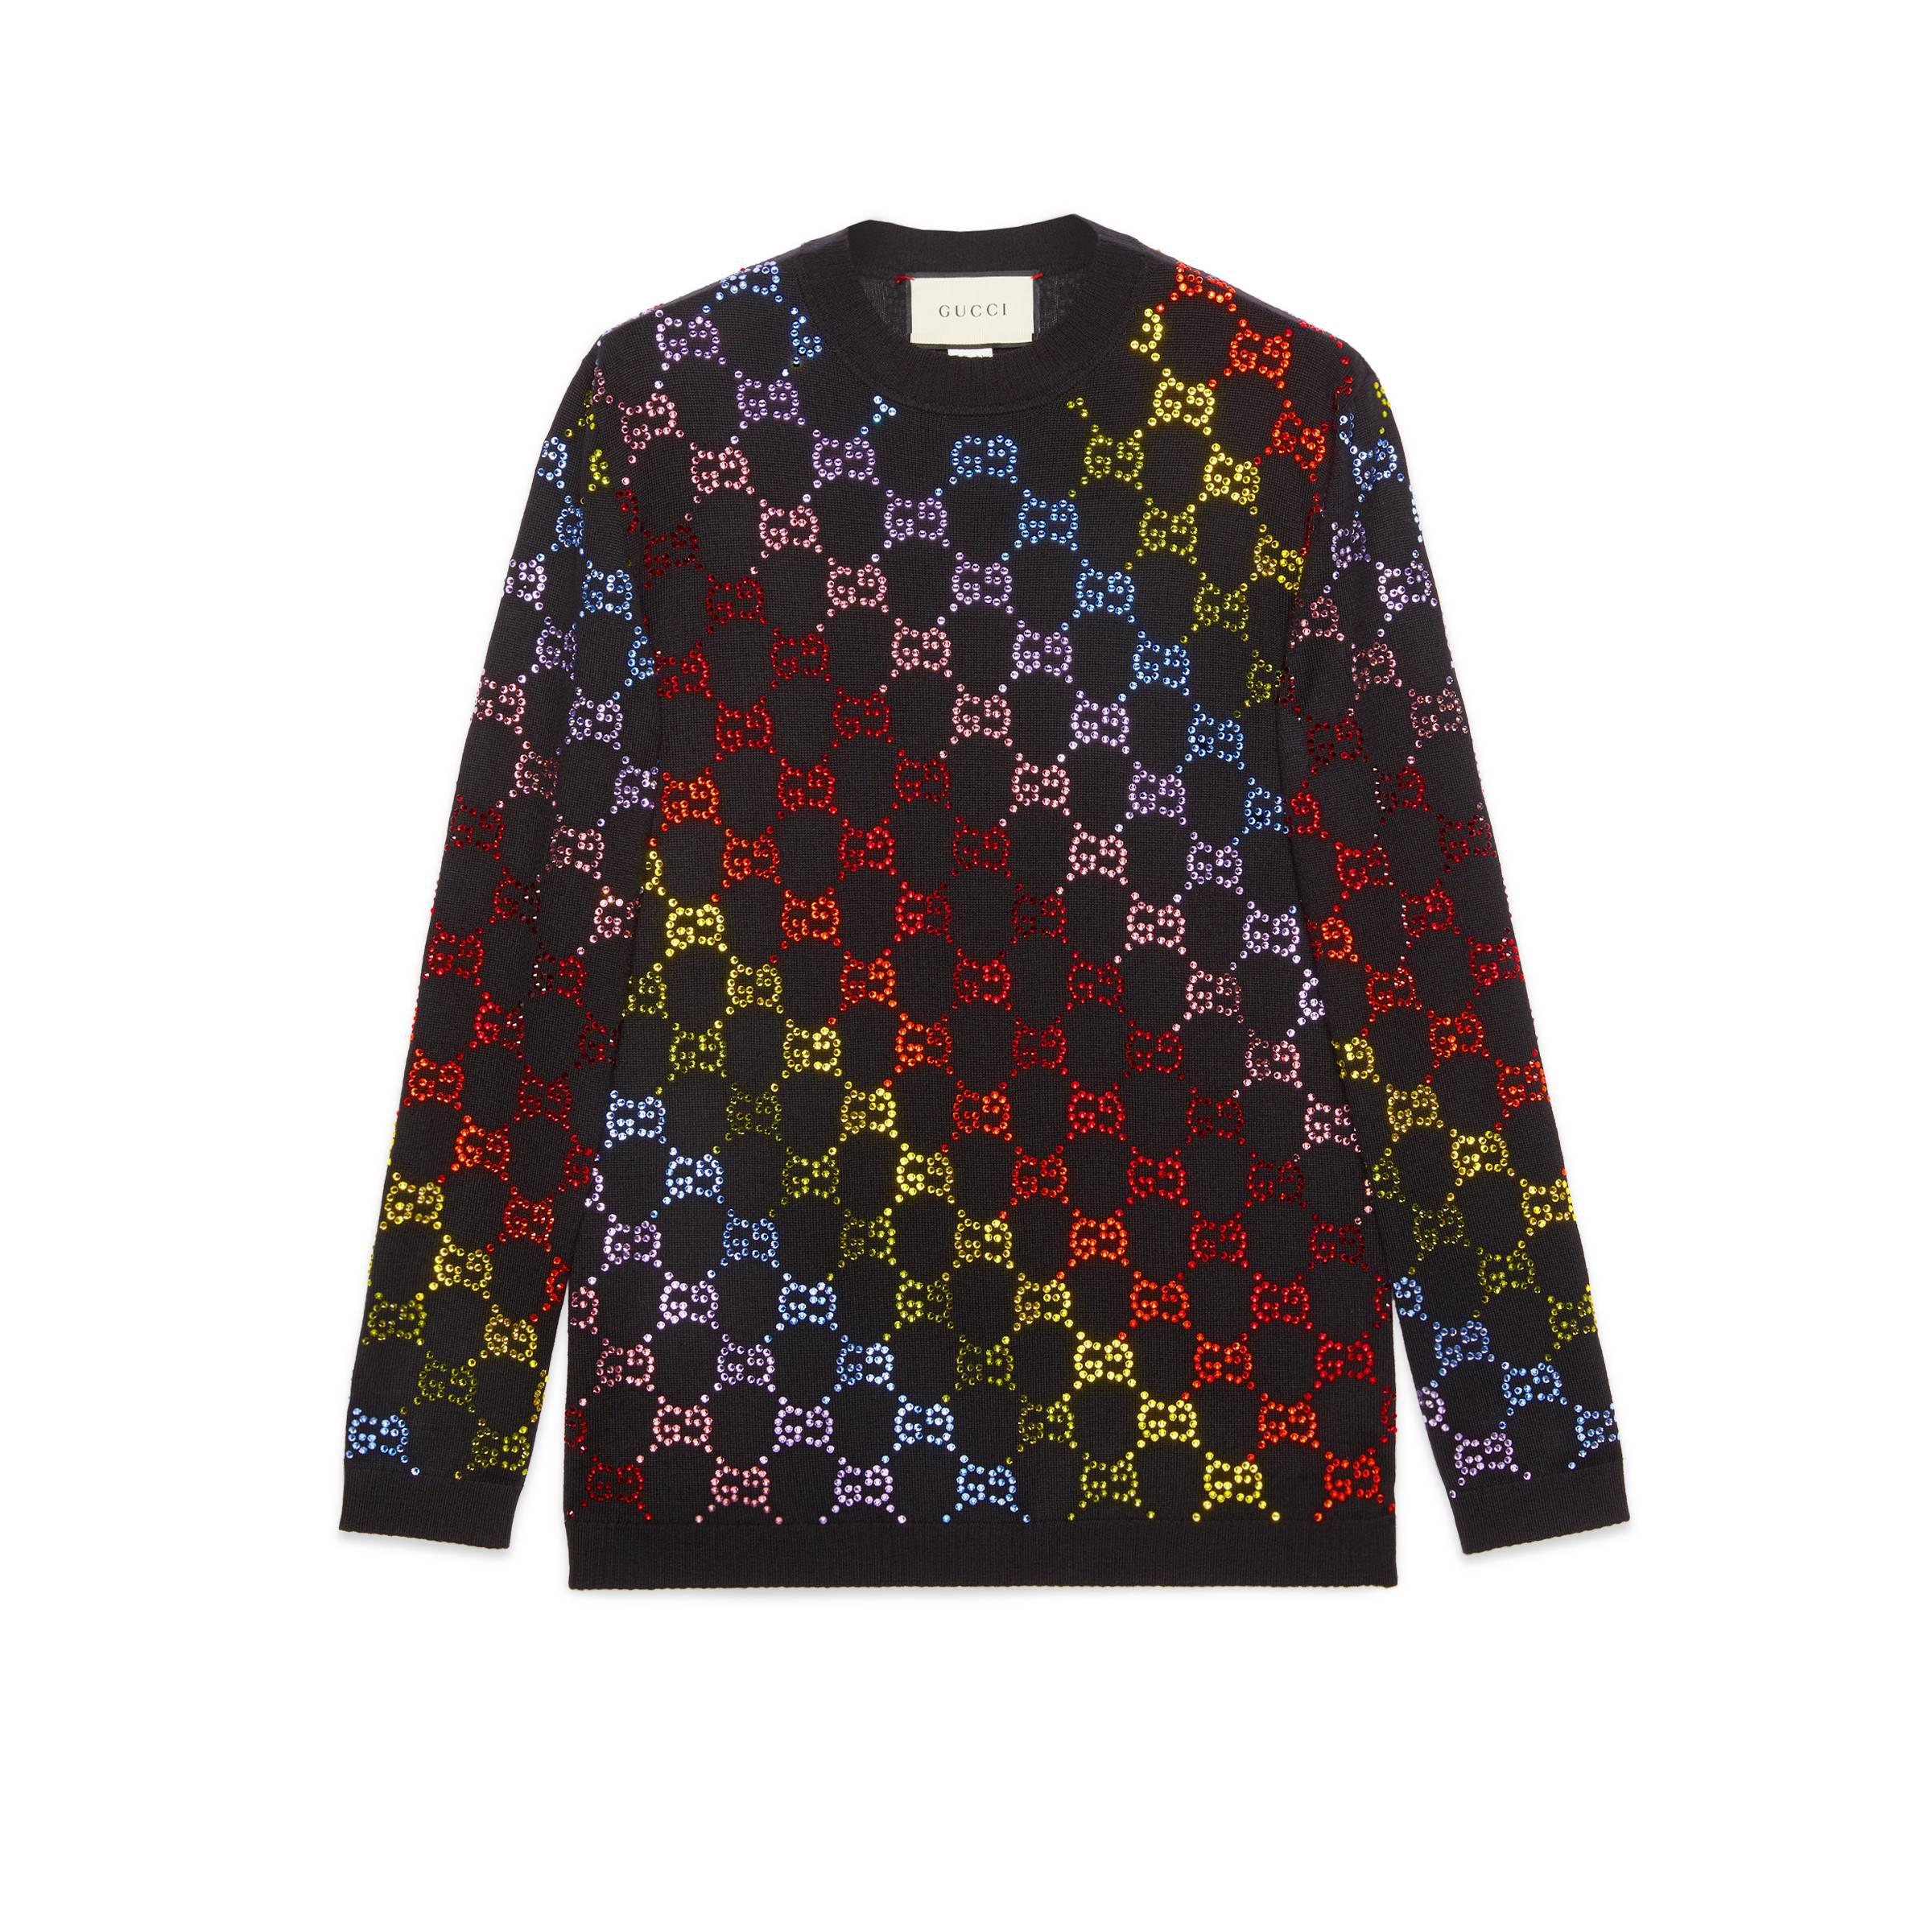 e17d68f7b7 Gucci Wool Sweater With GG Rhinestone Motif in Black - Lyst